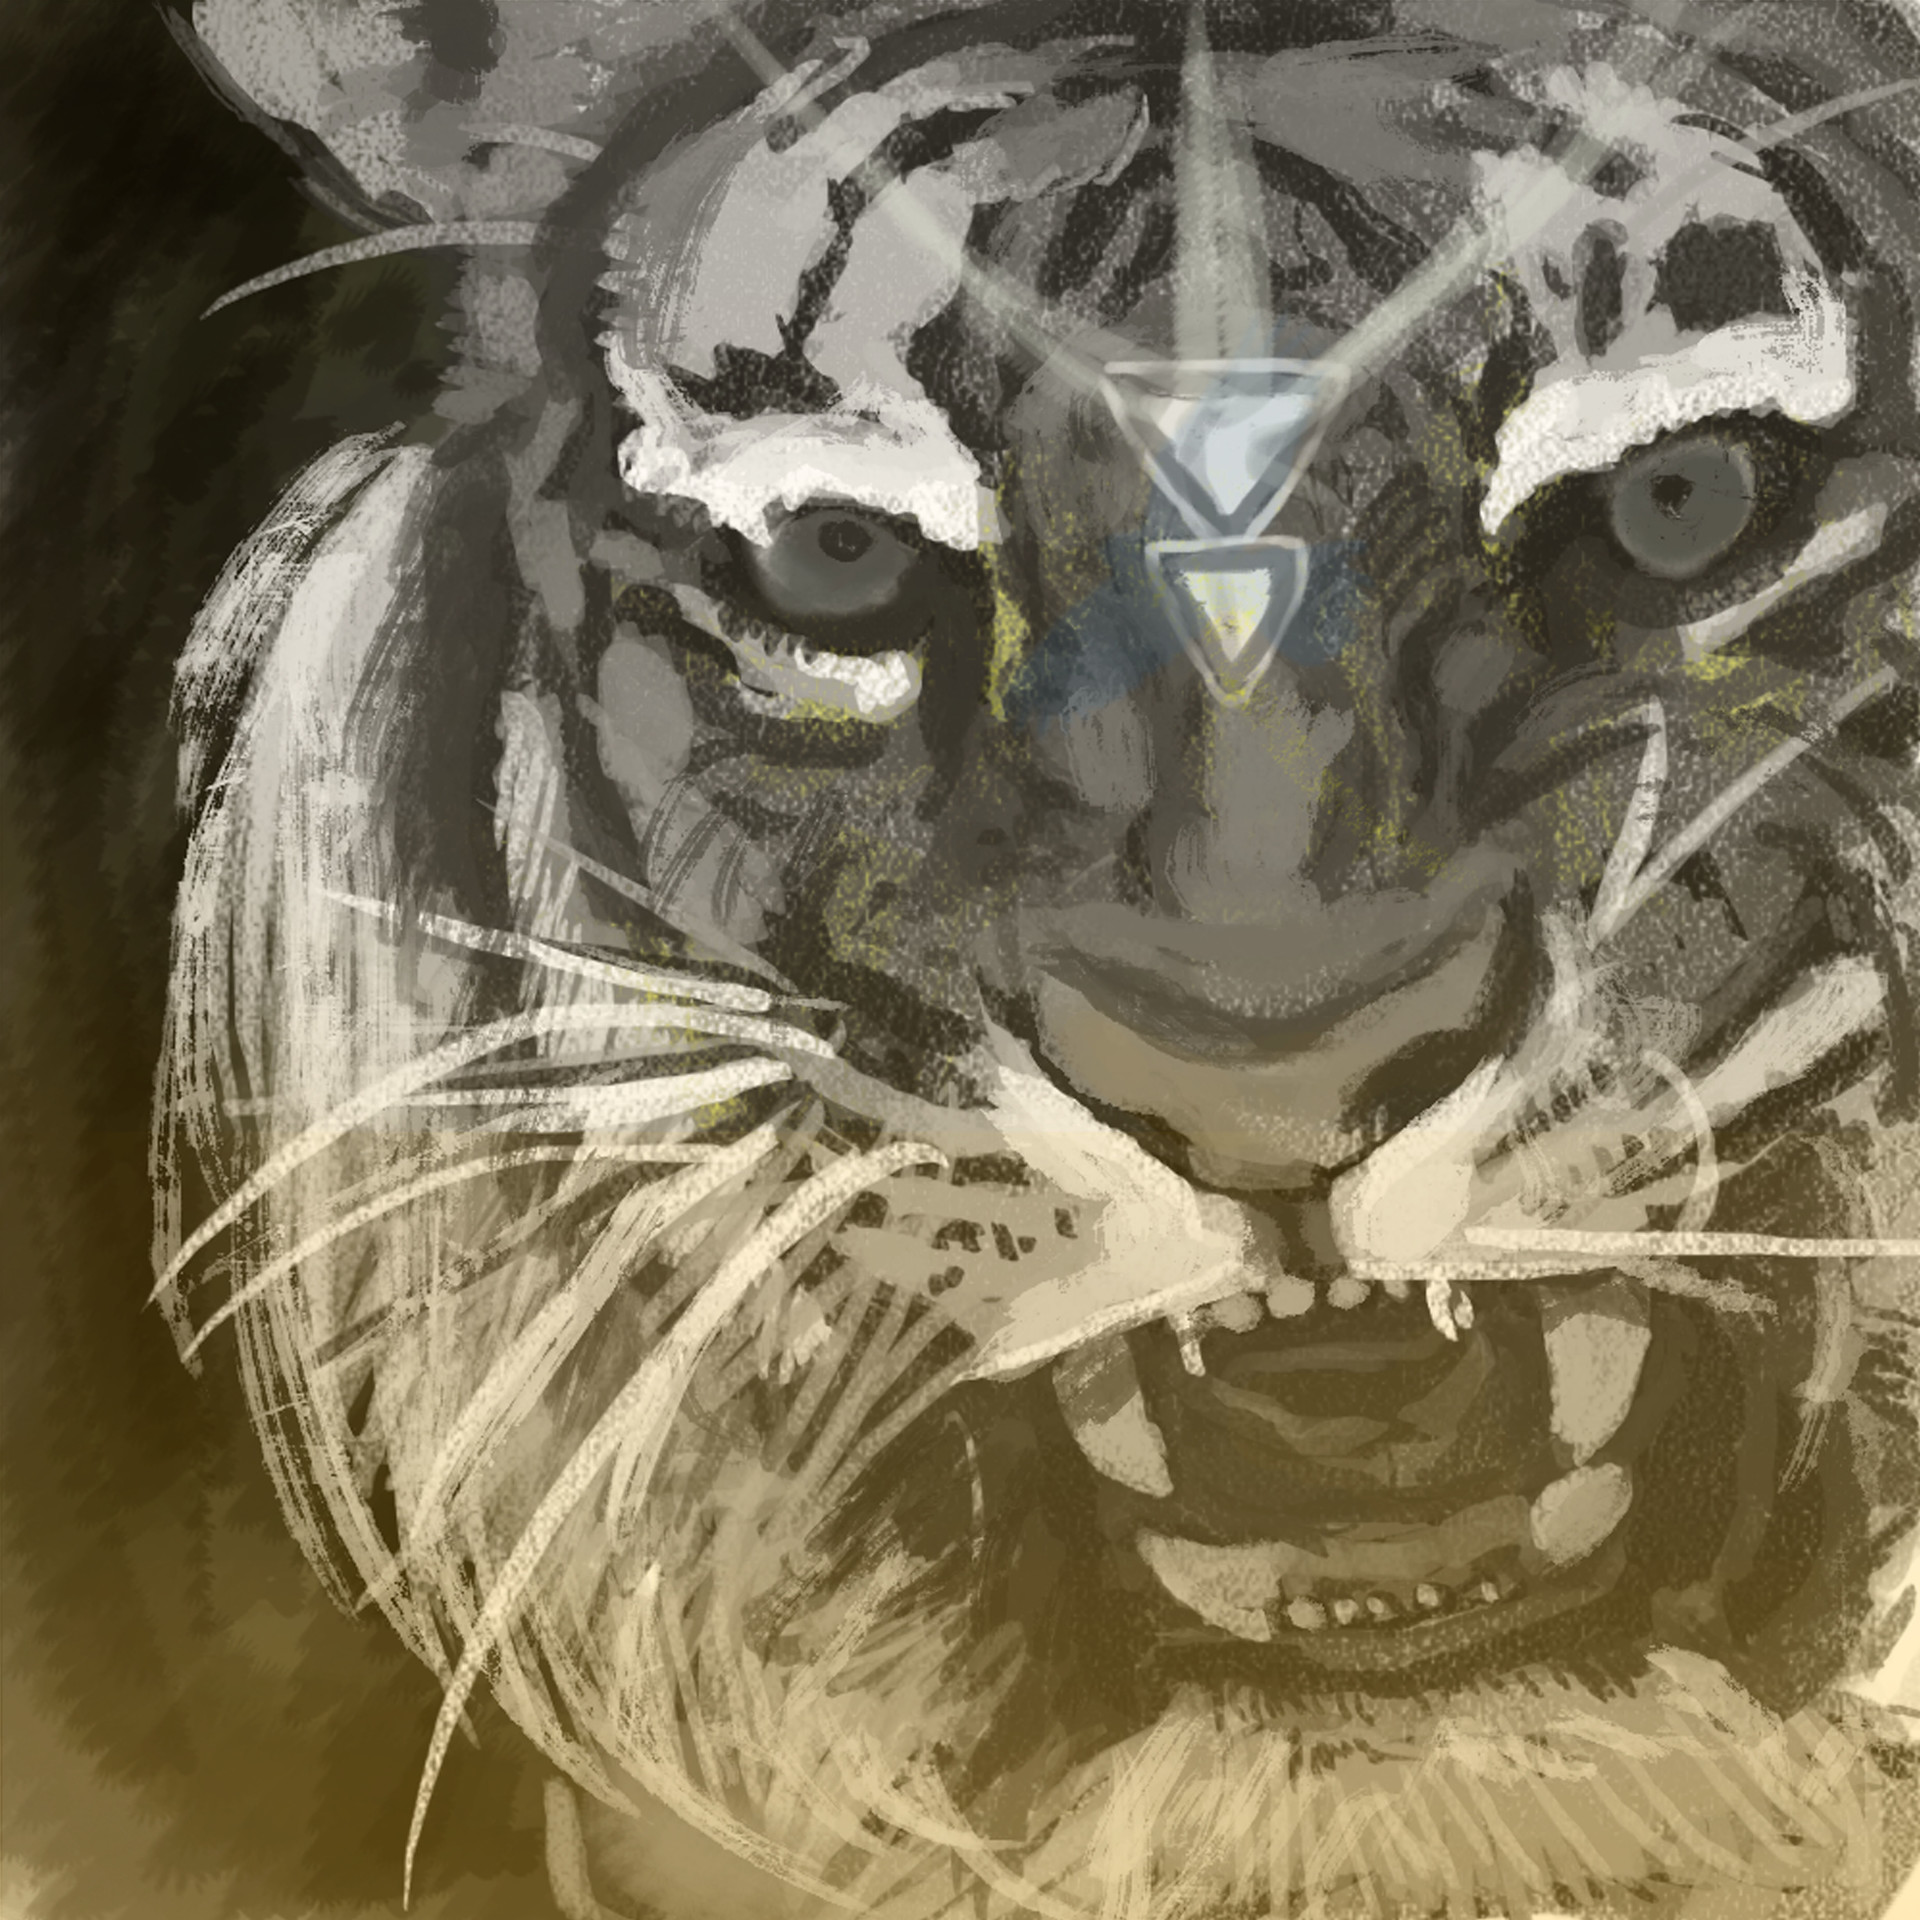 Styven bedoya tigre